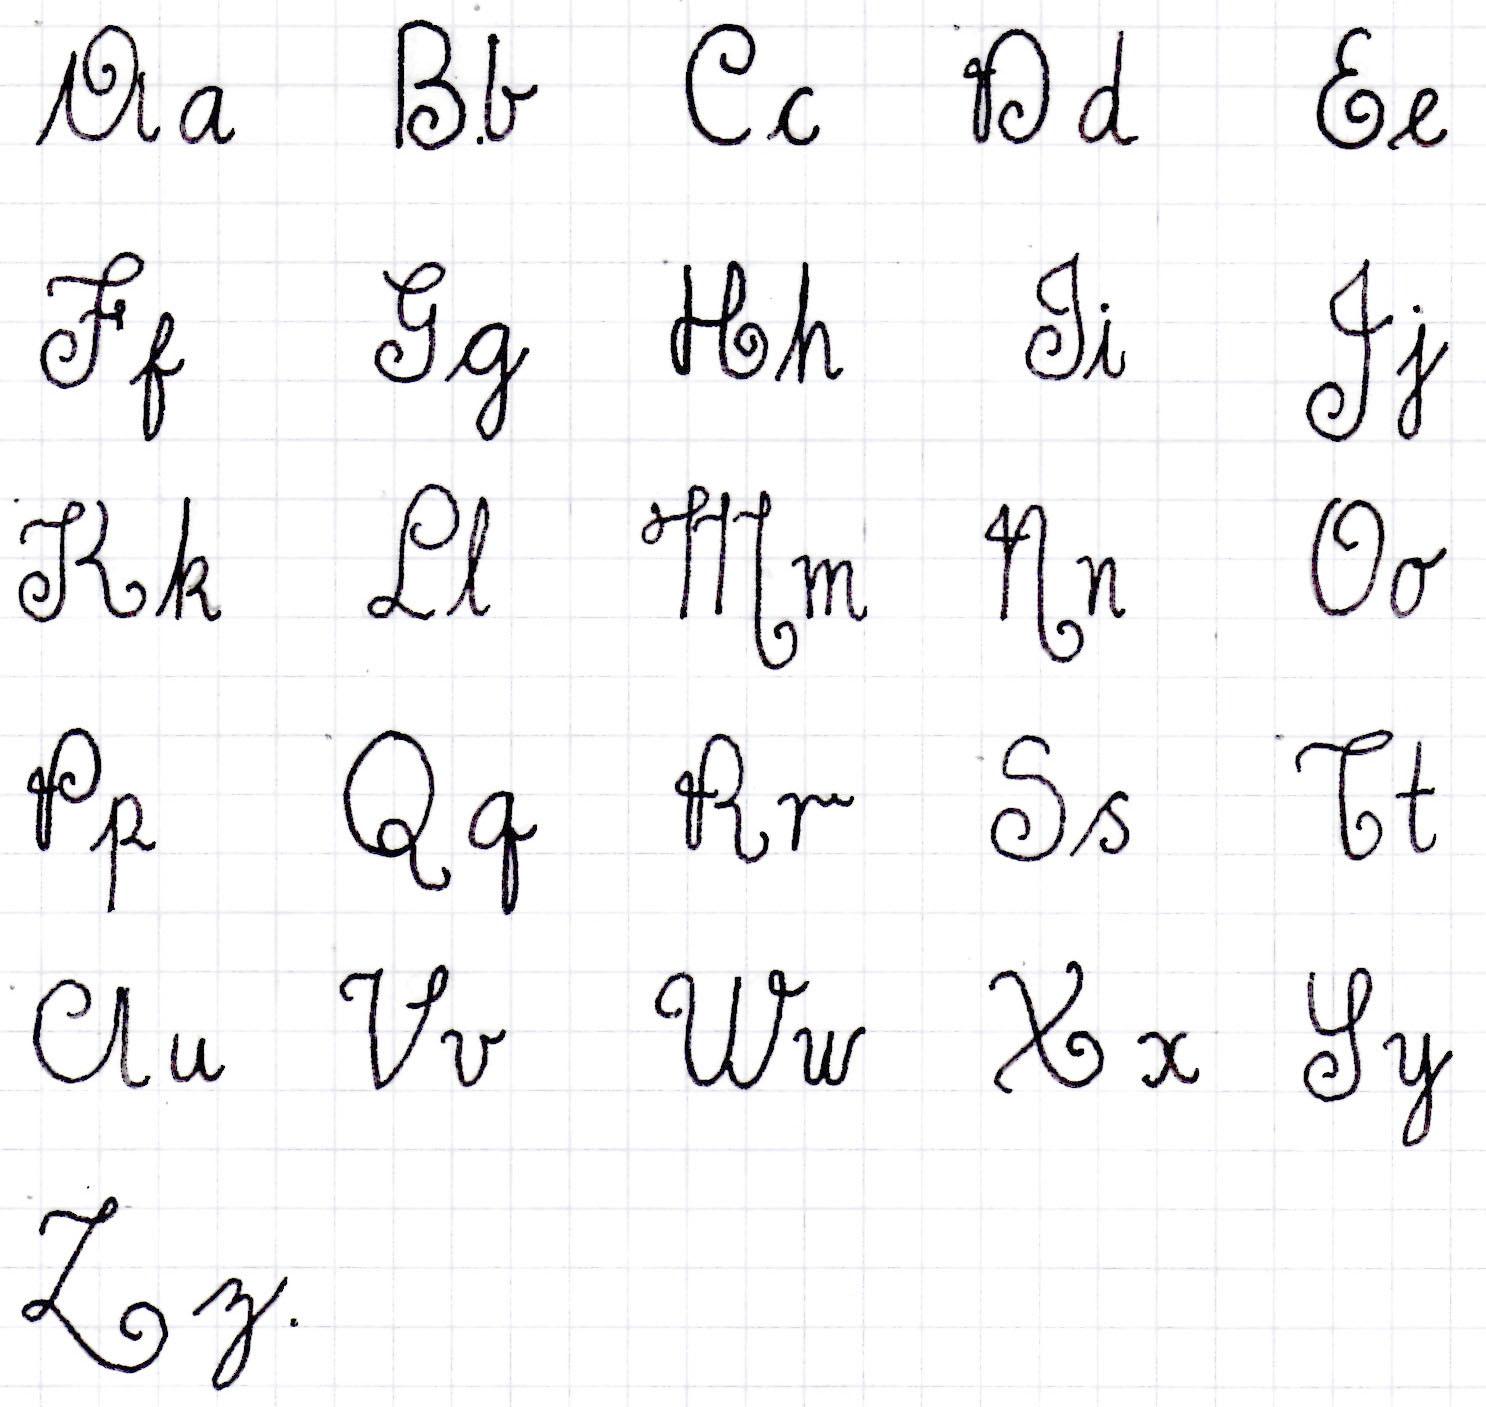 Calligraphy Fonts - 1001 Free Fonts